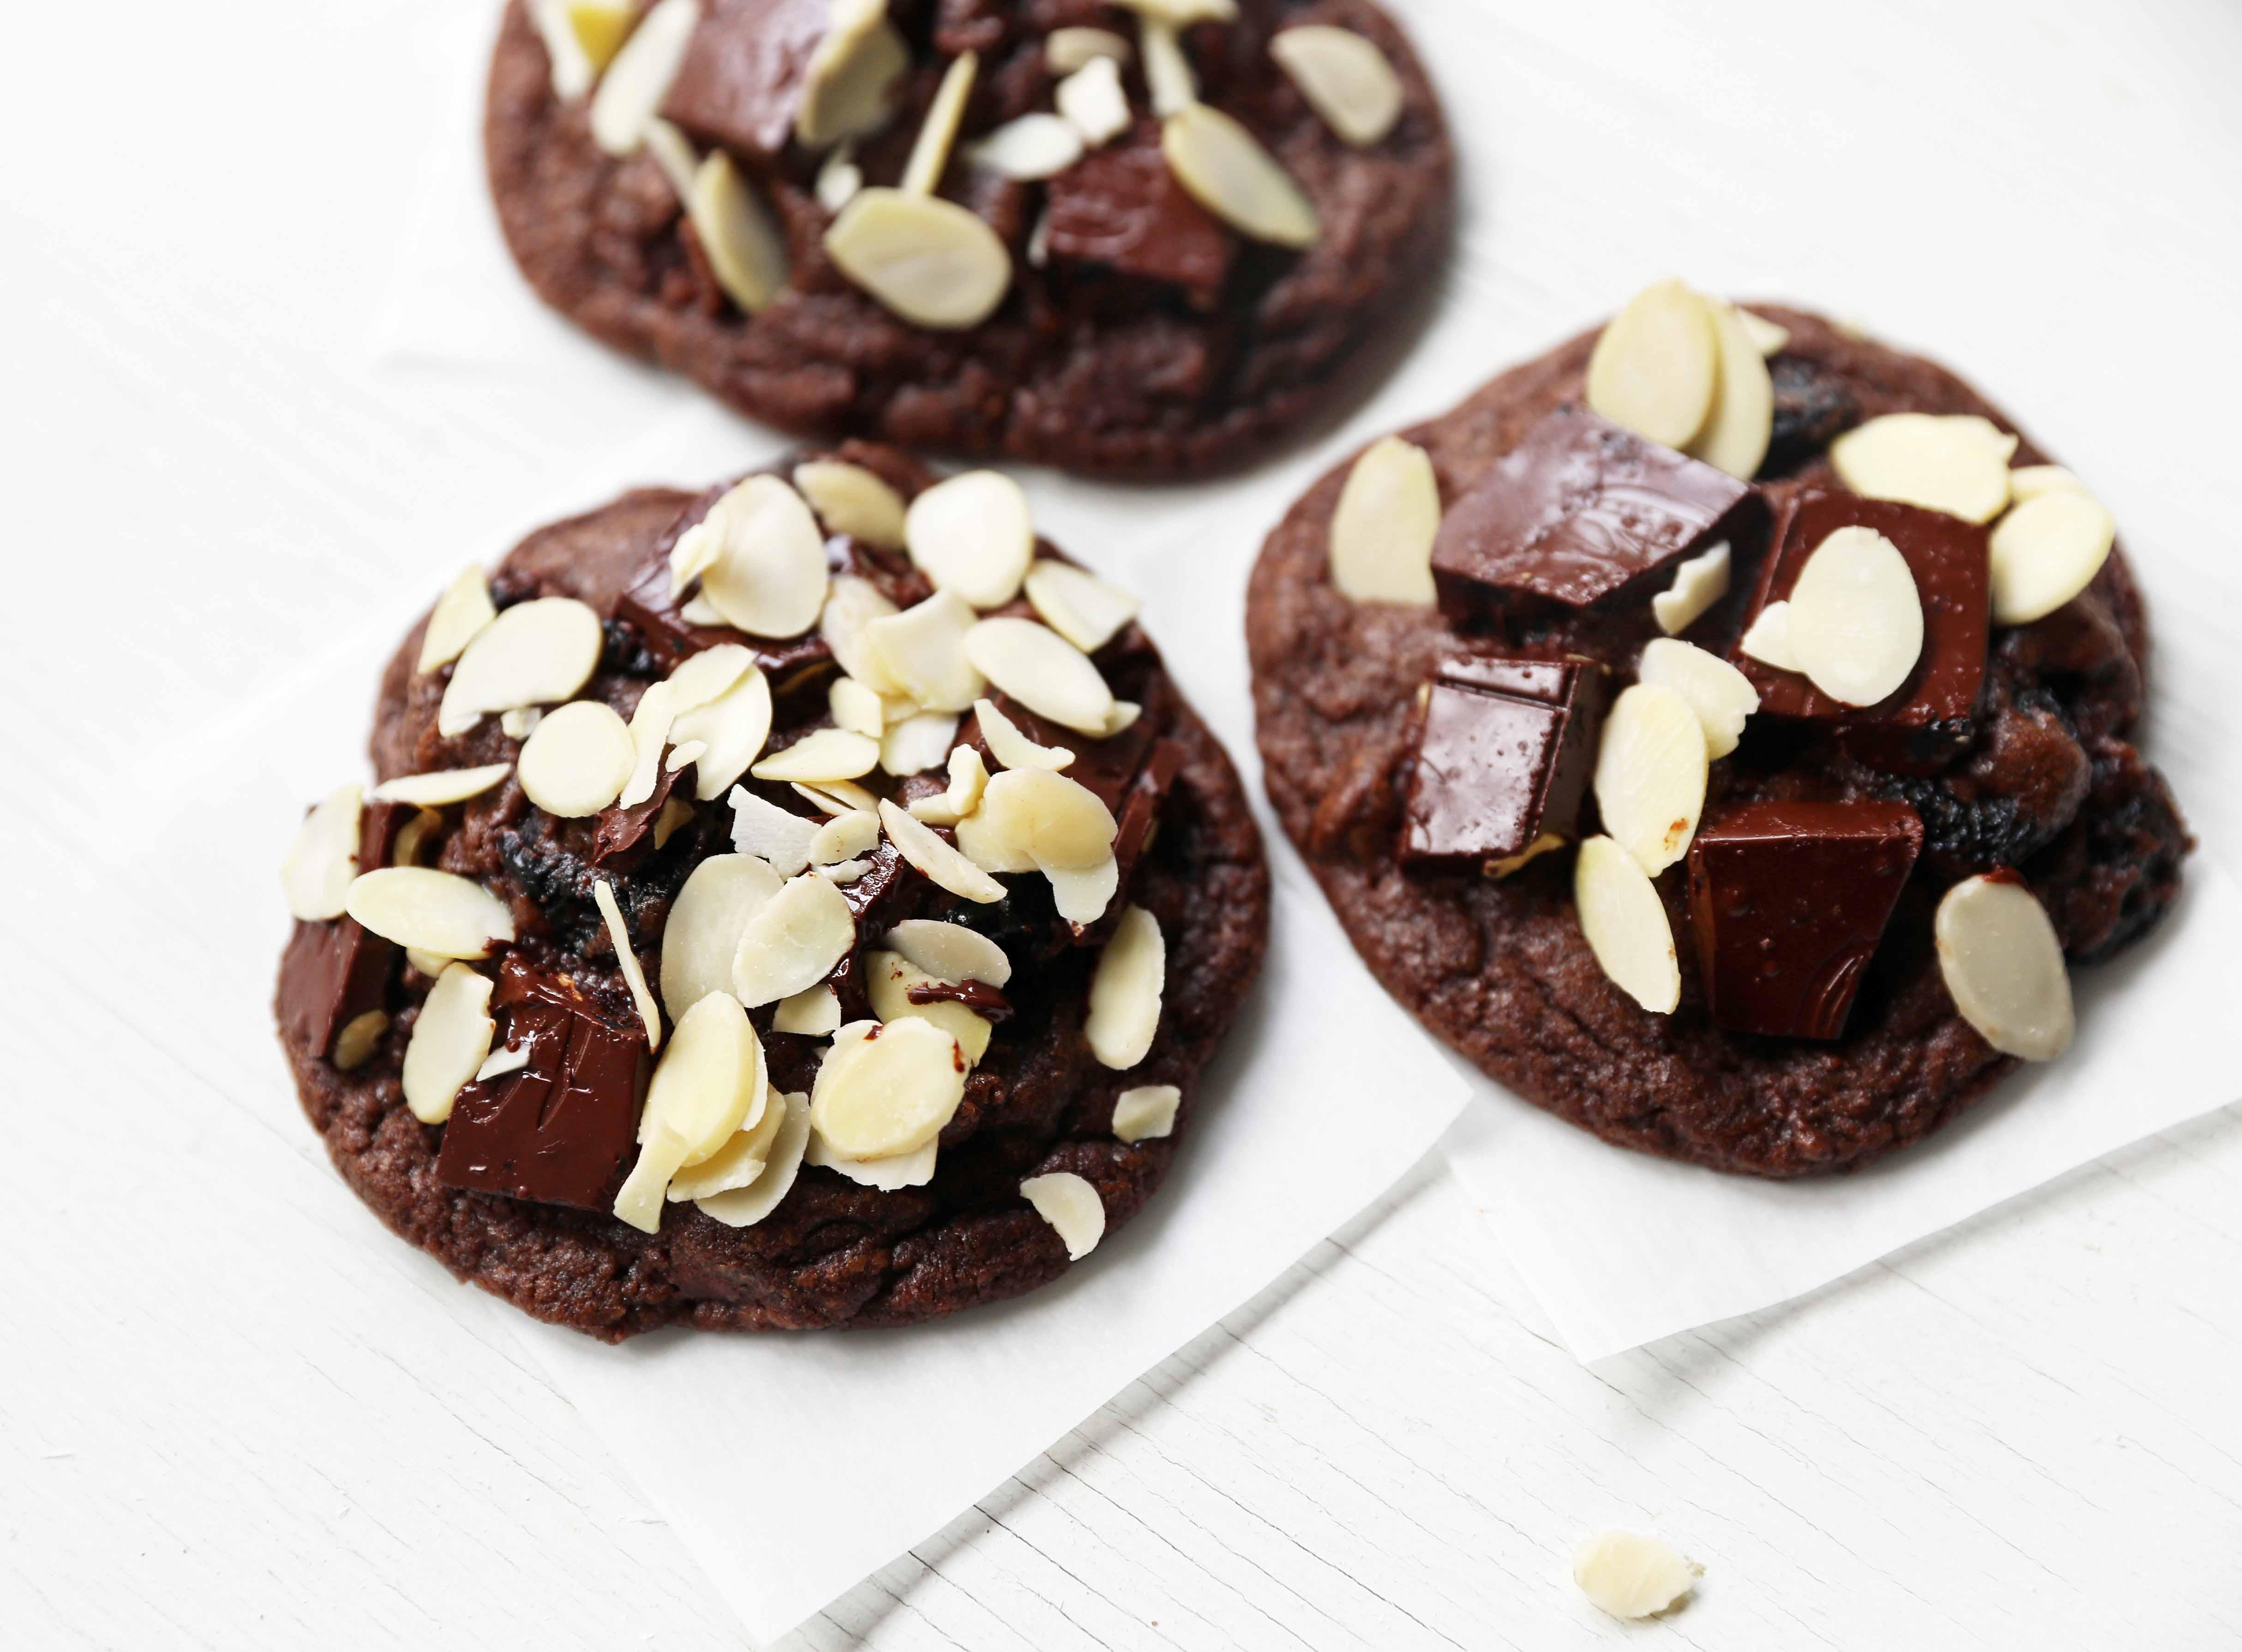 Chocolate Cherry Almond Cookies. Decadent chocolate chunk cookies with dried cherries and sliced almonds. A rich chocolate cherry chunk cookie! www.modernhoney.com #cherrychocolatecookies #chocolatecherrycookies #chocolatecookies #chocolatecookie